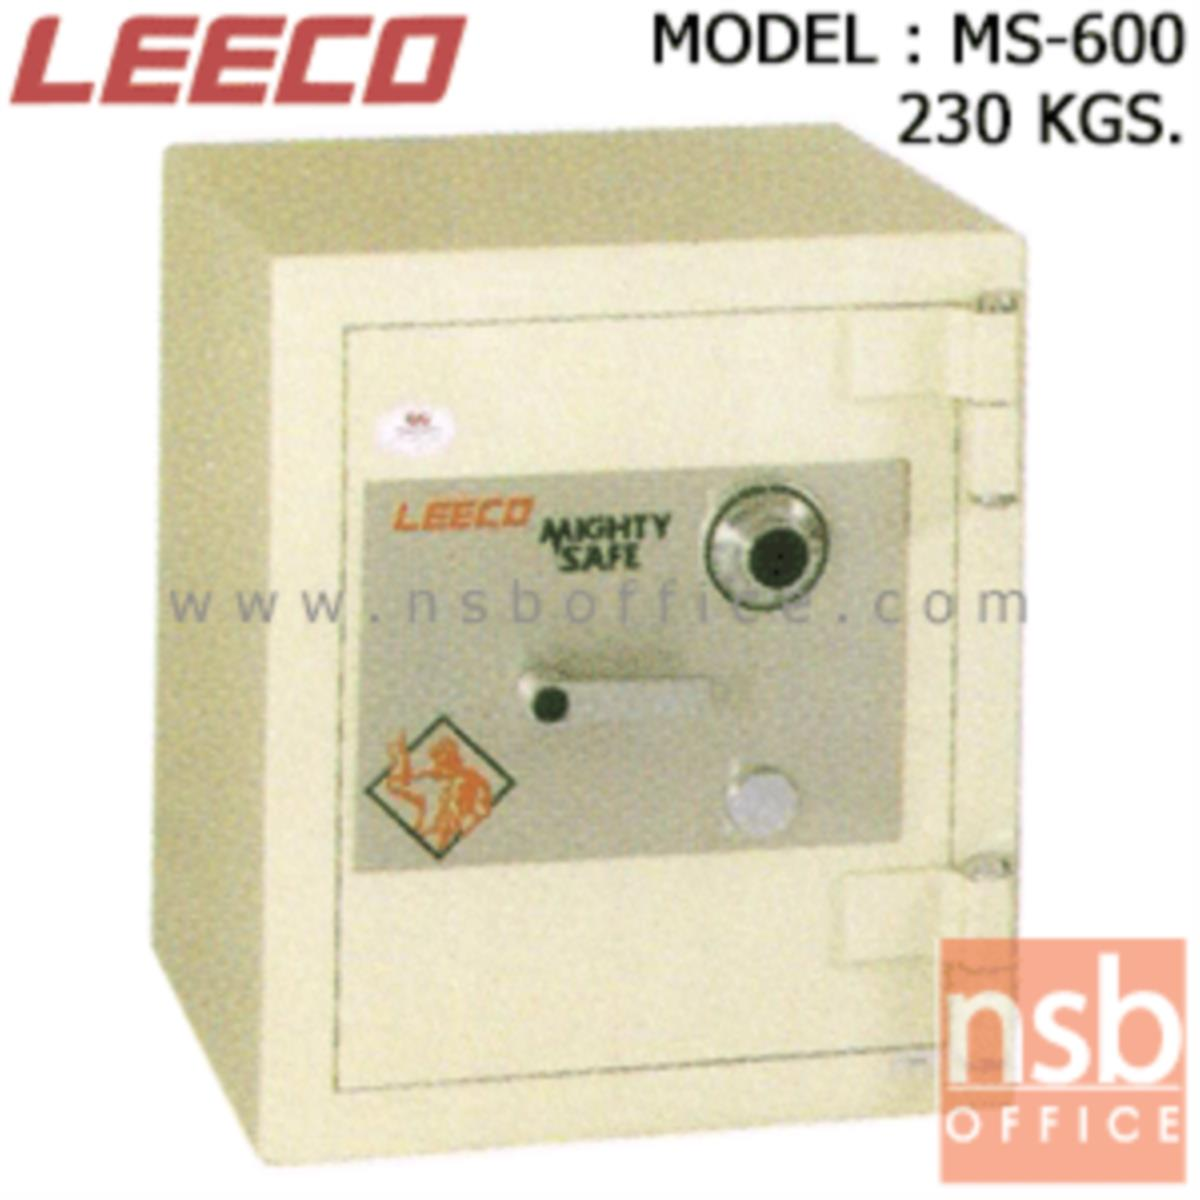 F02A017:ตู้เซฟนิรภัย 230 กก. ลีโก้ รุ่น LEECO-MS-600 มี 1 กุญแจ 1 รหัส (เปลี่ยนรหัสไม่ได้)